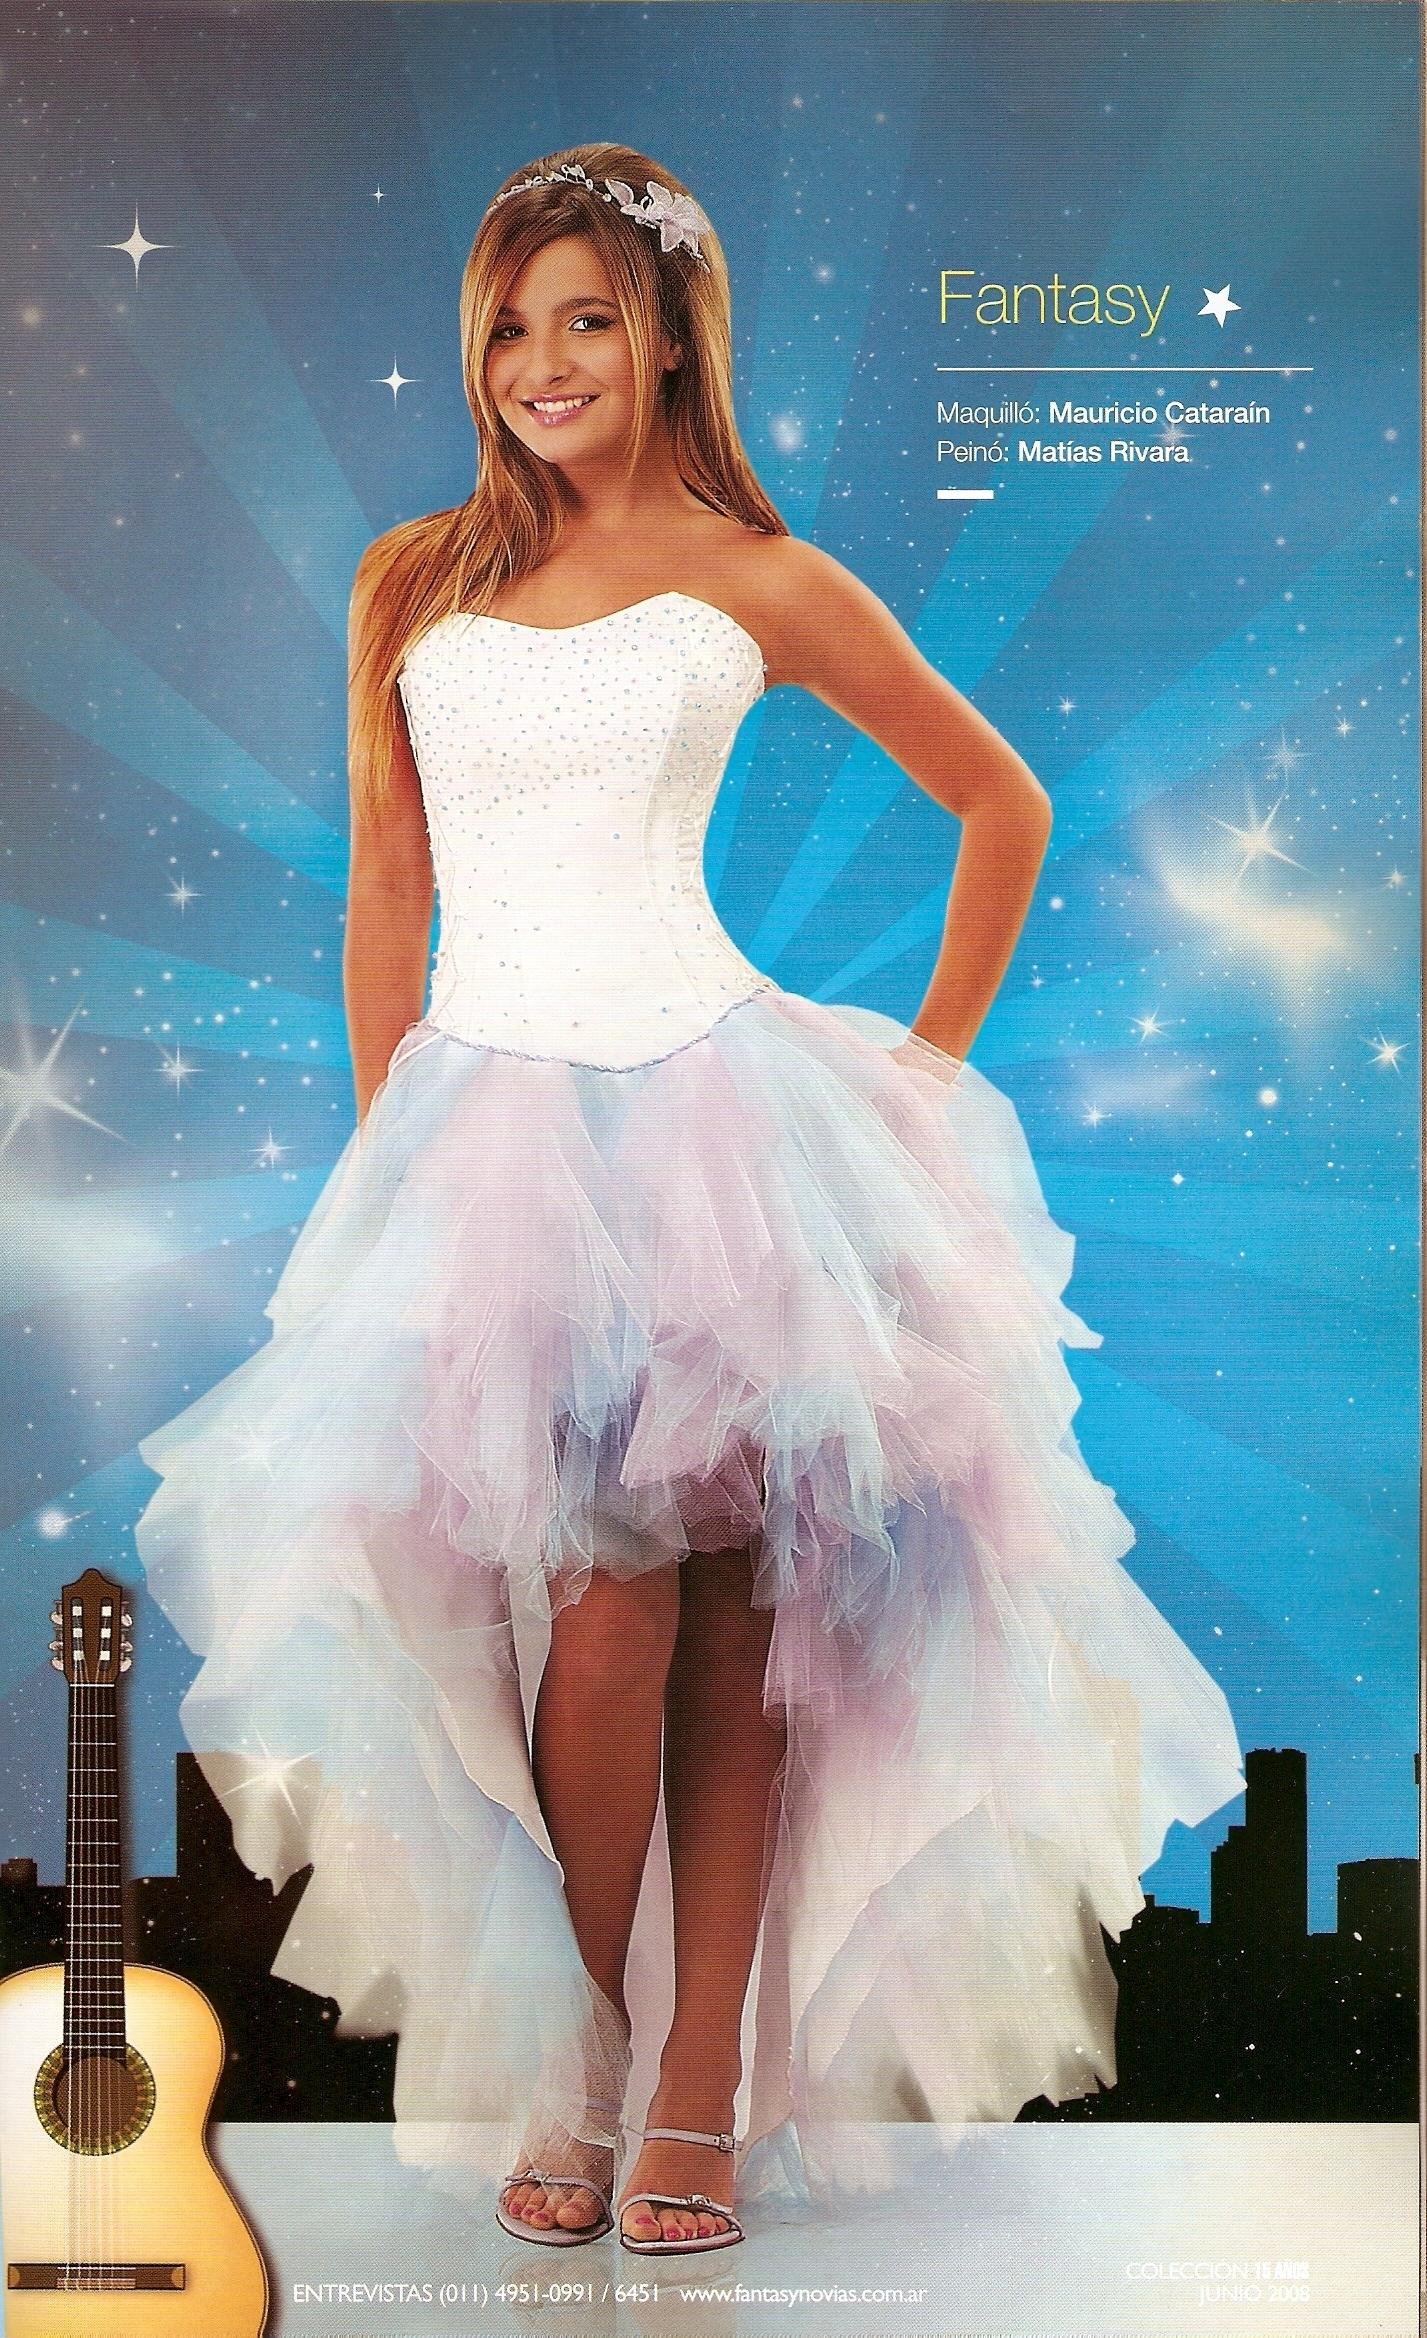 Brenda on the magazine cover